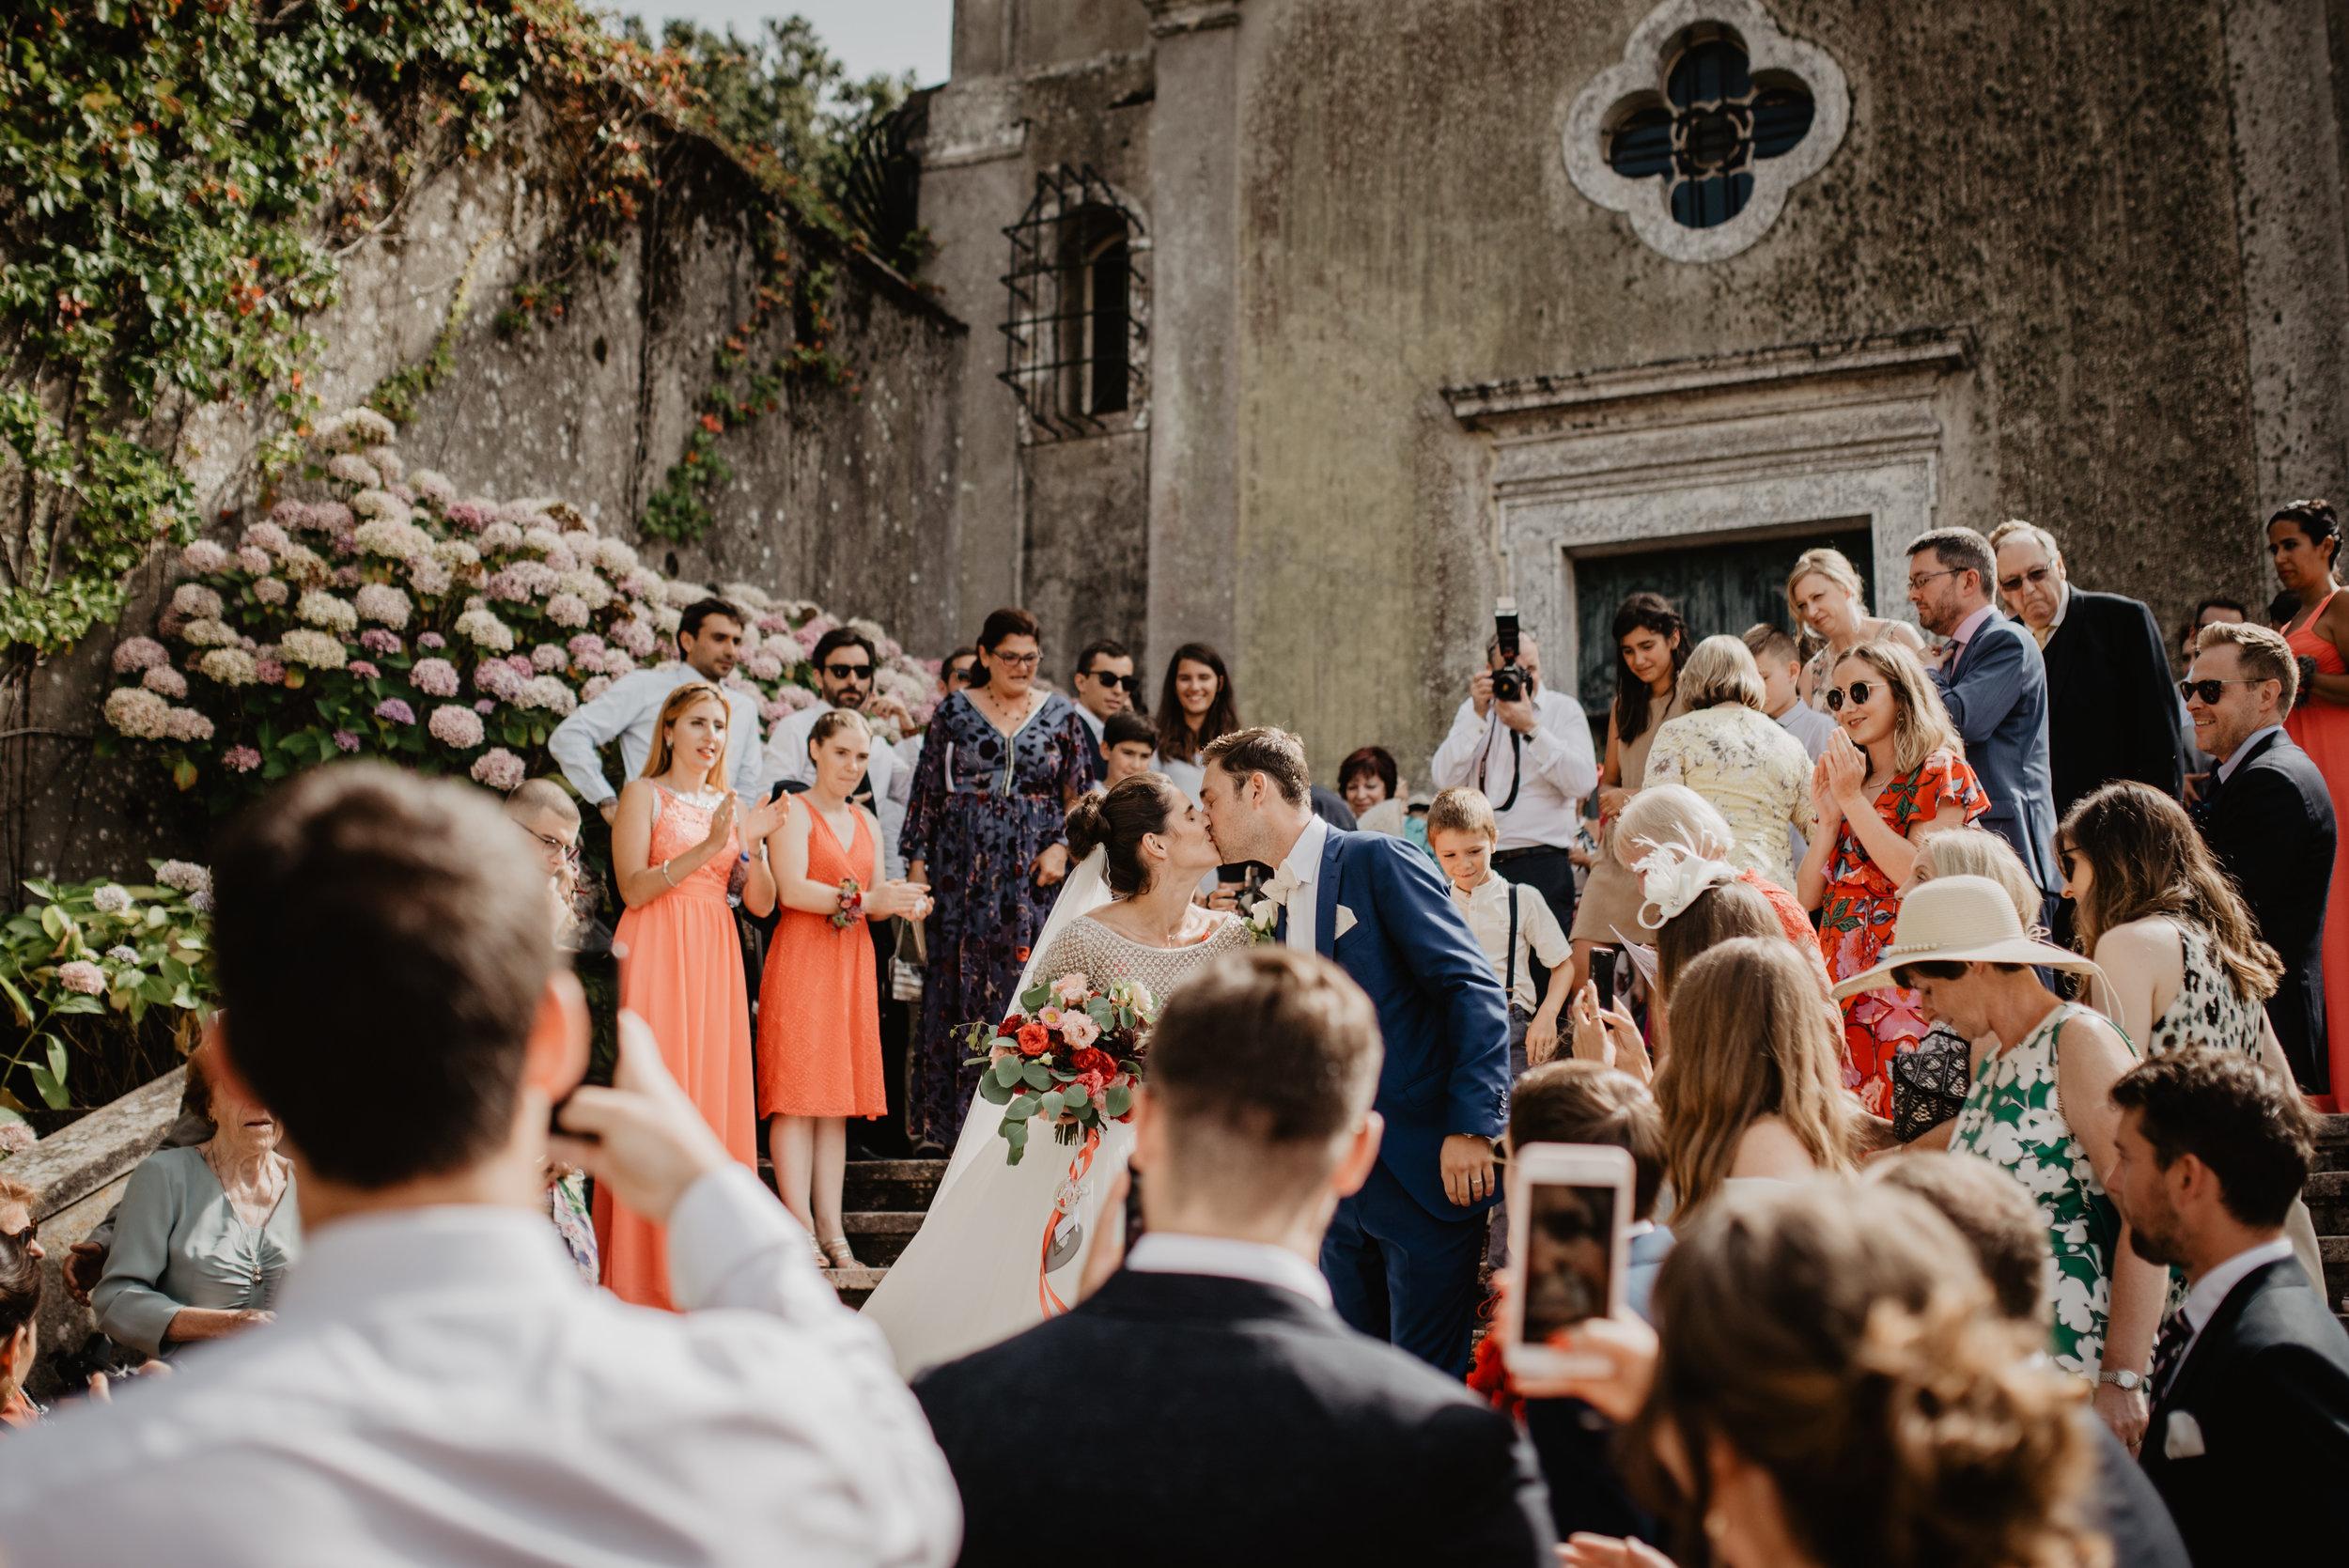 Lapela-photography-wedding-sintra-portugal-65.jpg